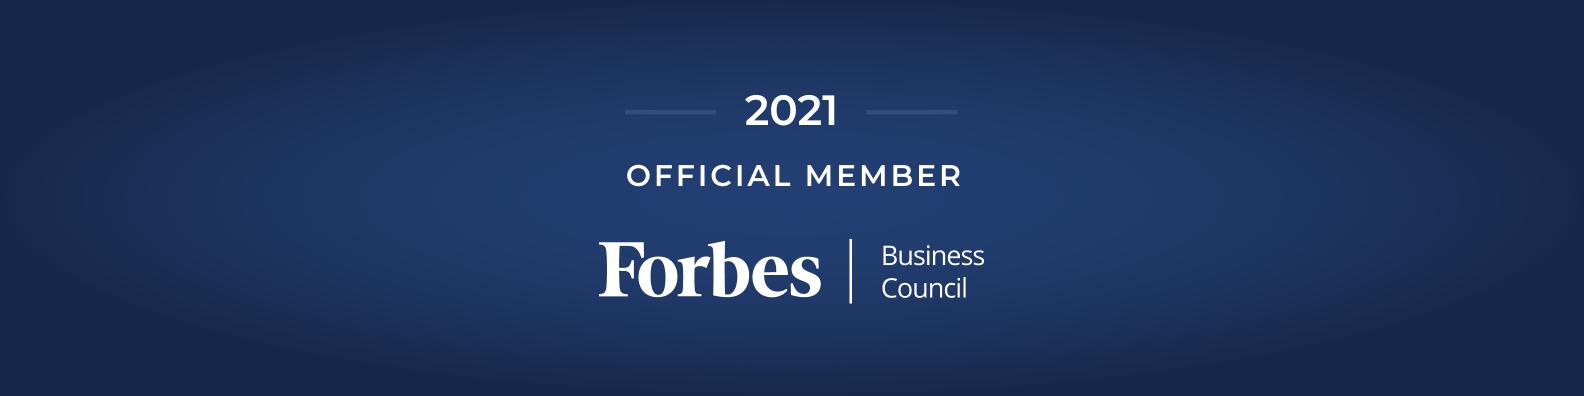 FBC-Social-LinkedIn-Cover-2021